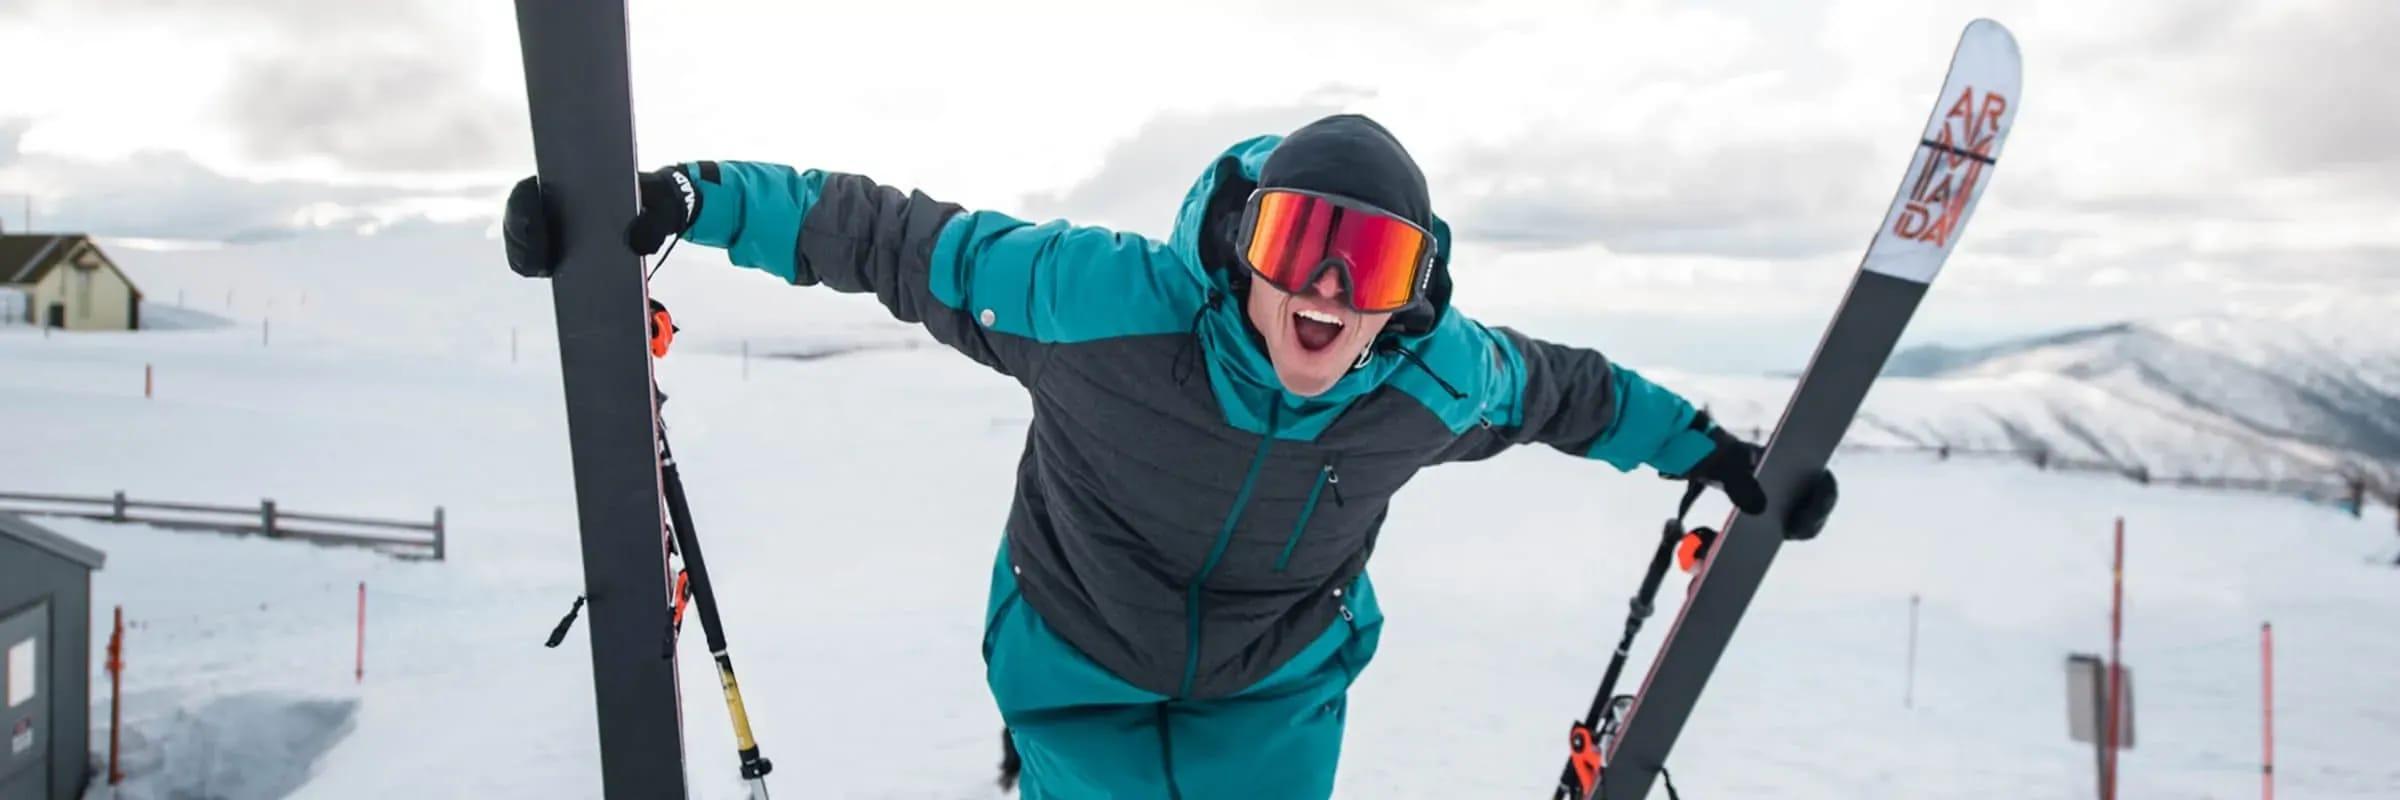 Best Ski Goggles for Winter 2021